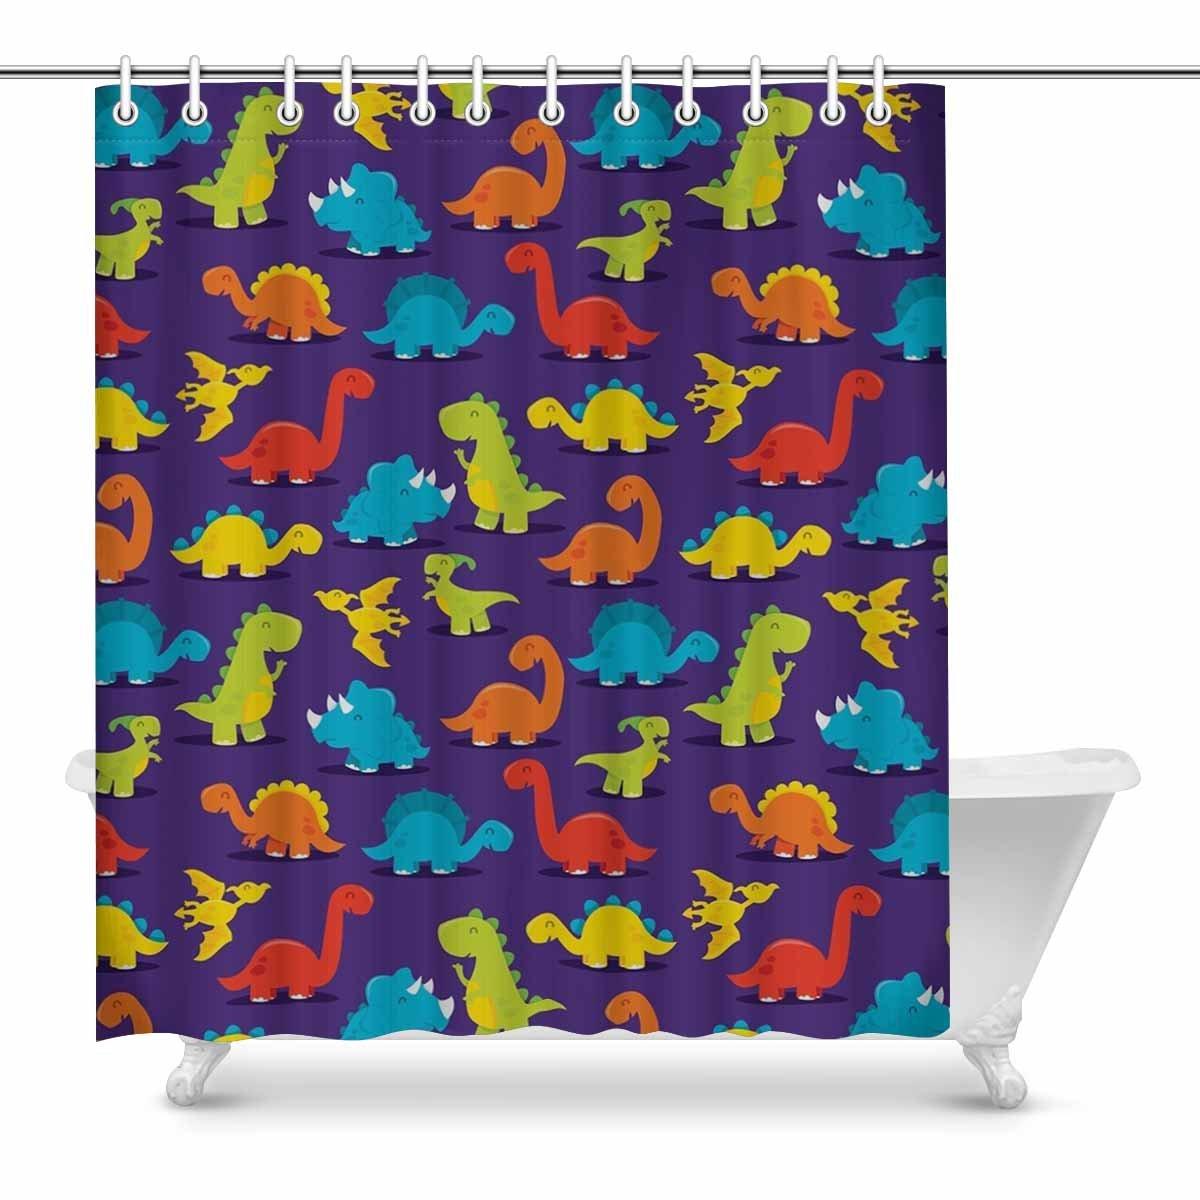 Astonishing Interestprint Lebaism Dinosaur Prints Shower Curtain For Download Free Architecture Designs Jebrpmadebymaigaardcom